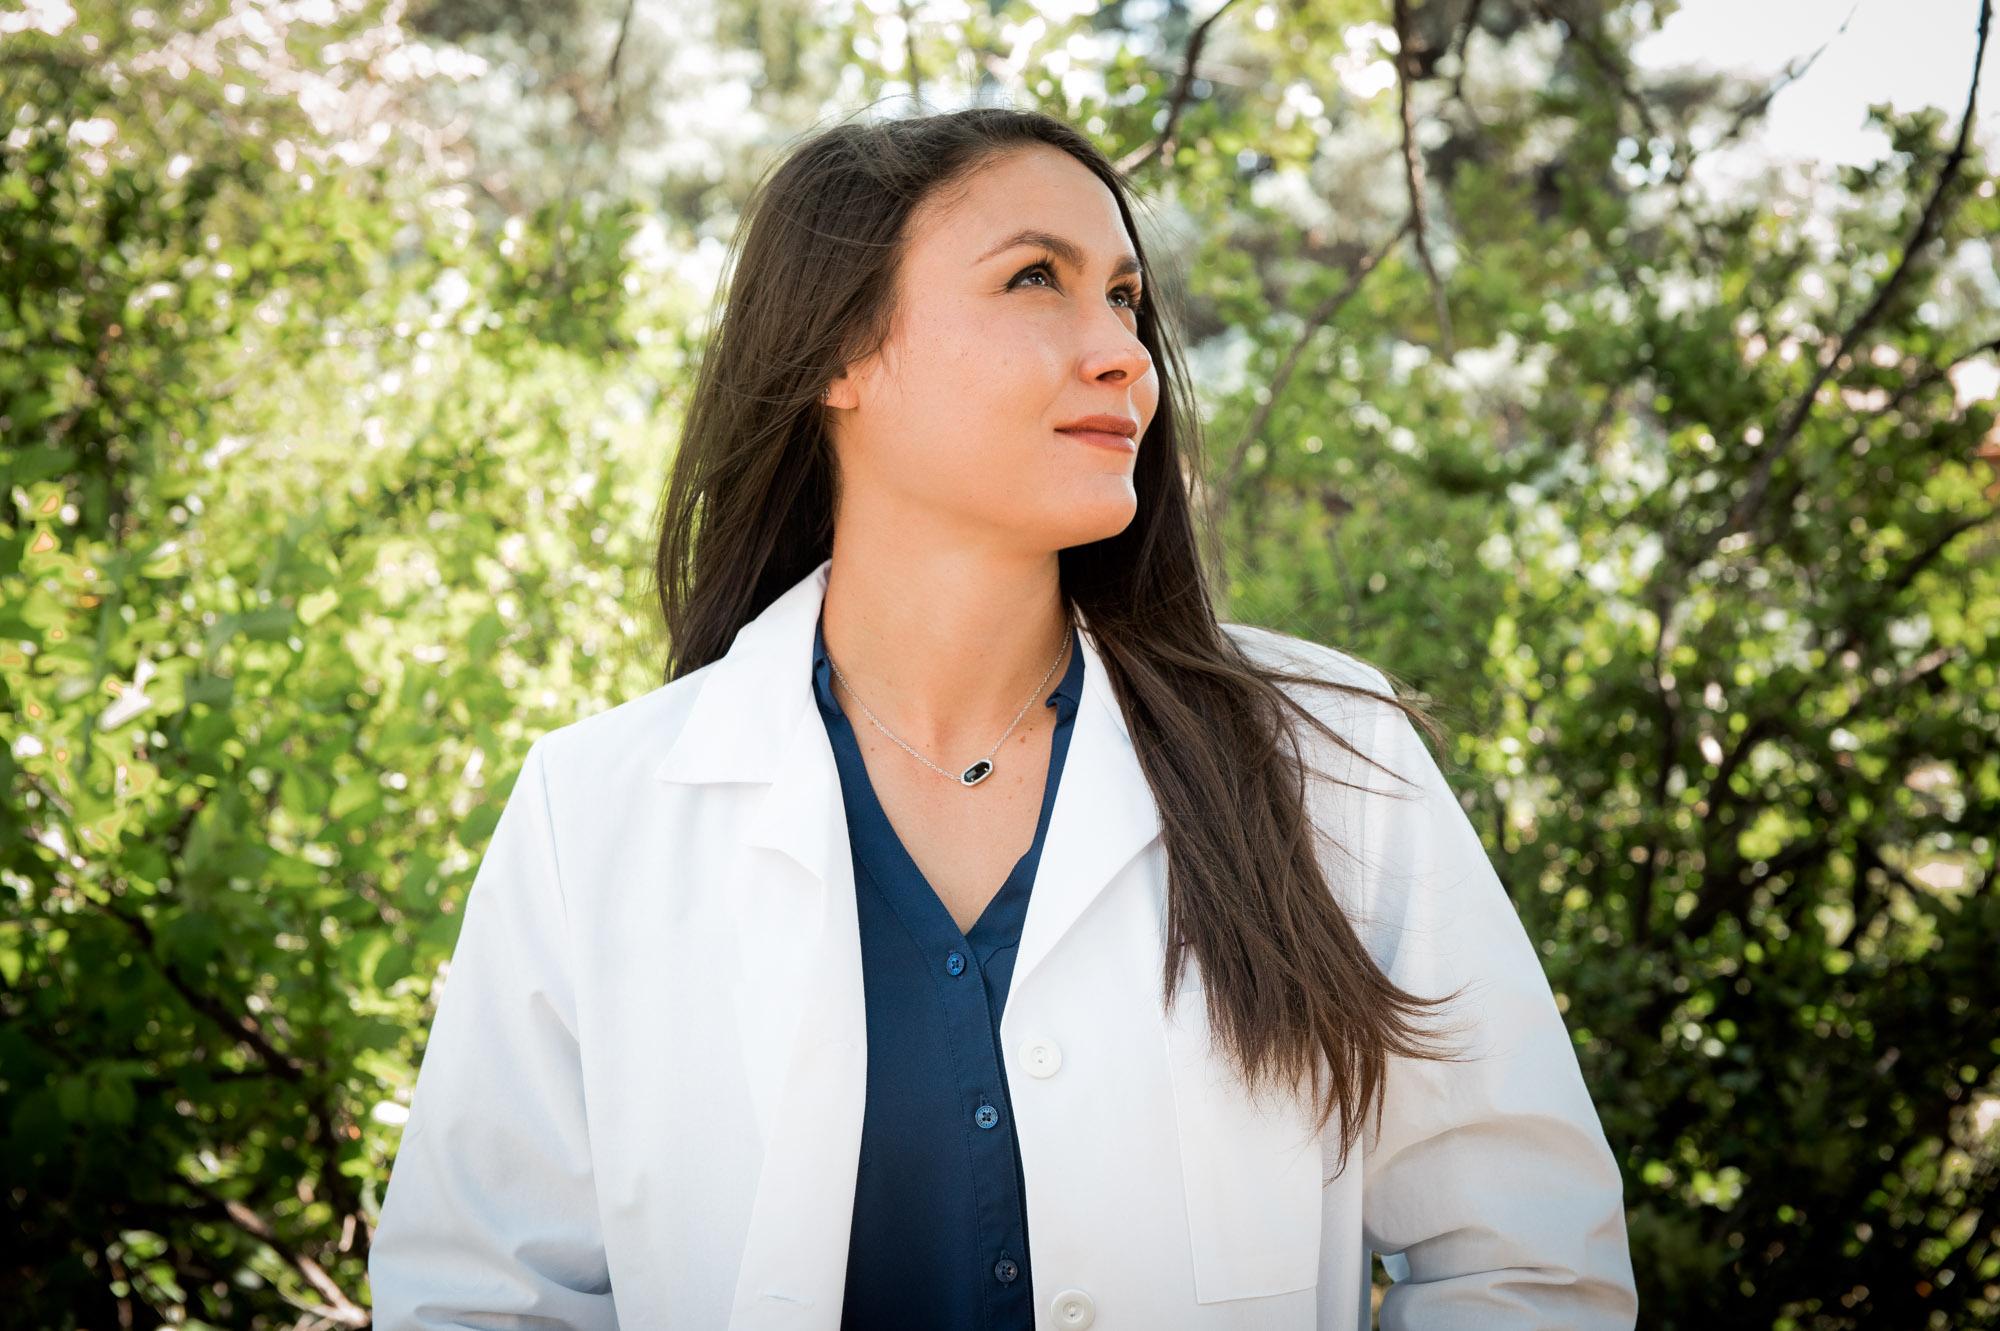 Lesha Estrada in her White coat